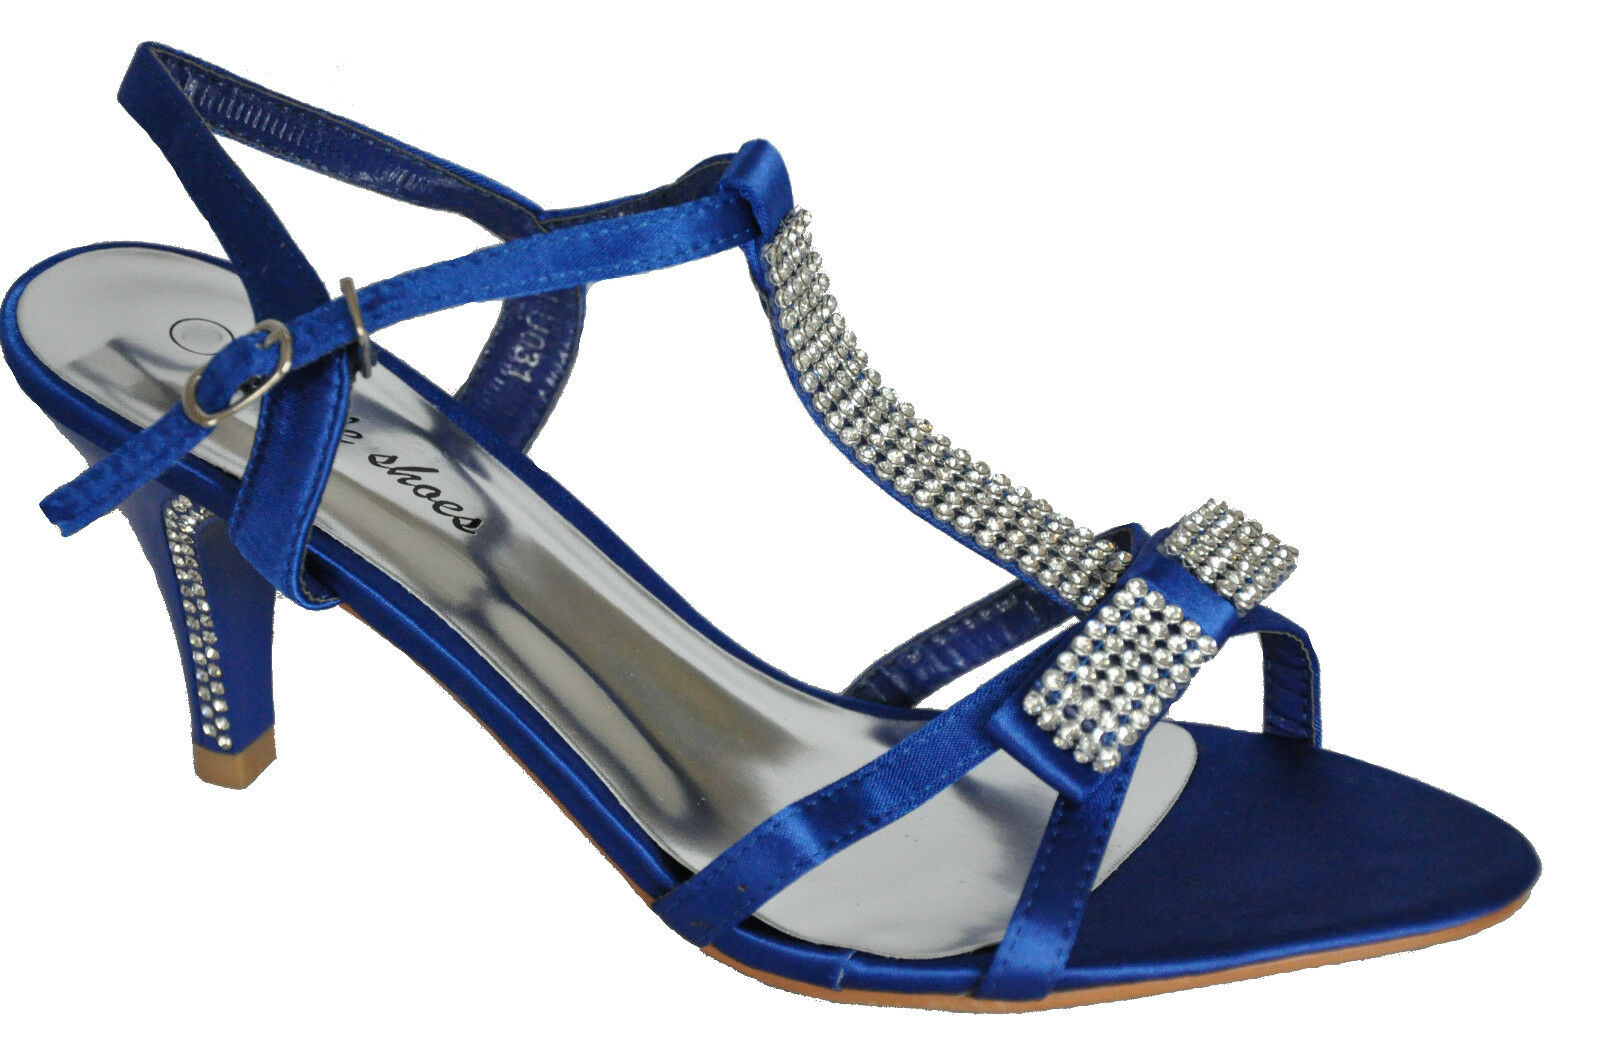 Satin Blue Diamante Heels Wedding Sandals Shoes UK 3 4 5 6 7 7.5